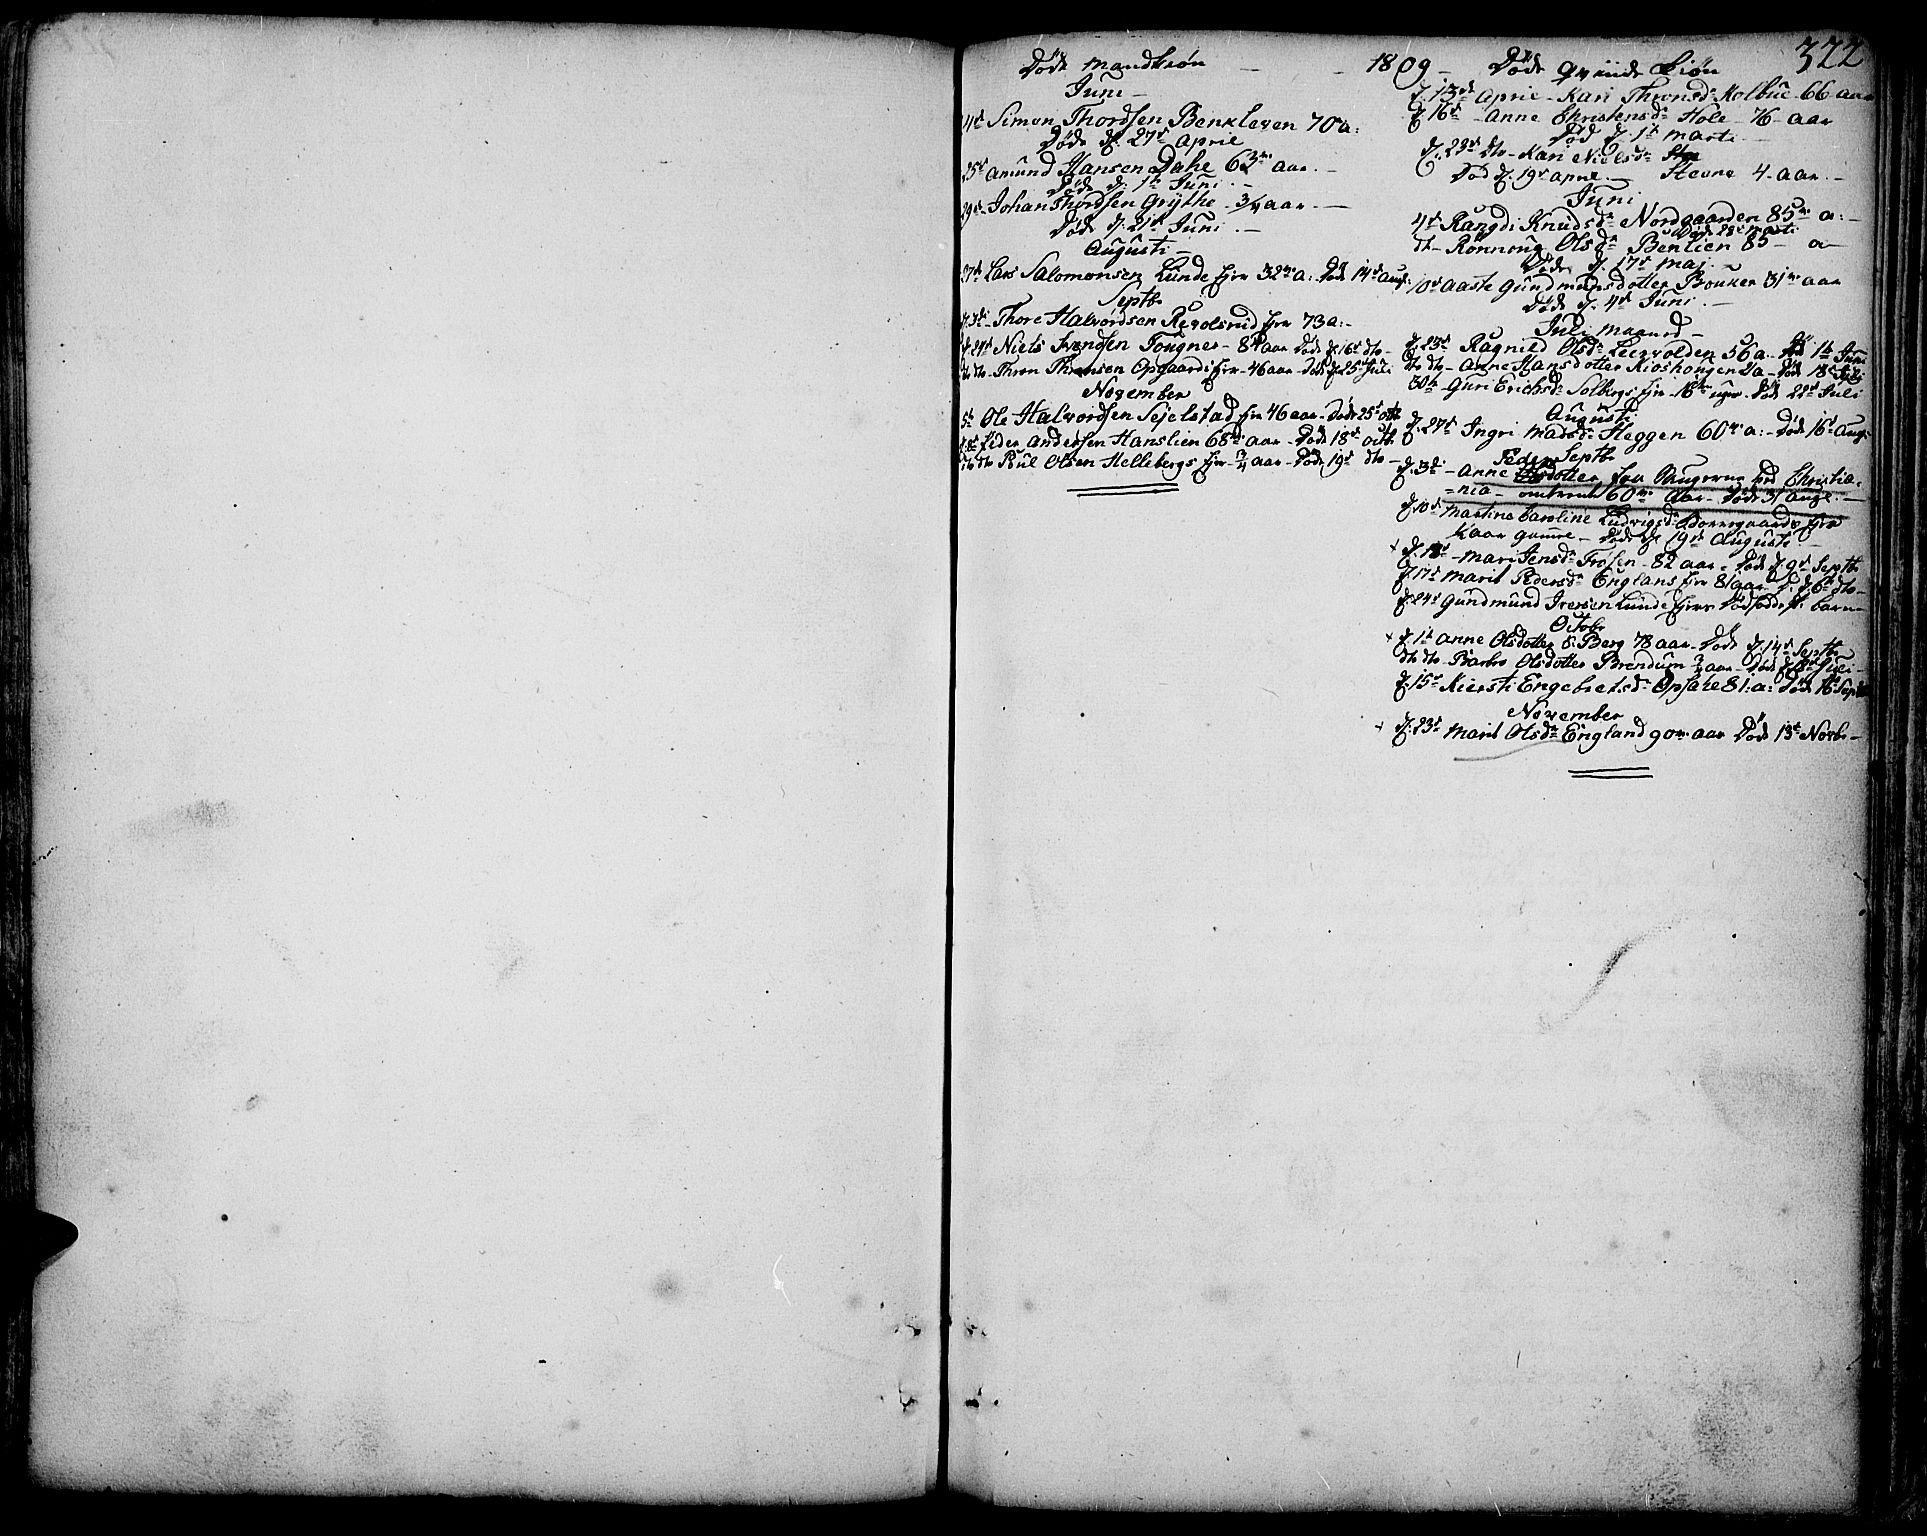 SAH, Gausdal prestekontor, Ministerialbok nr. 3, 1758-1809, s. 322